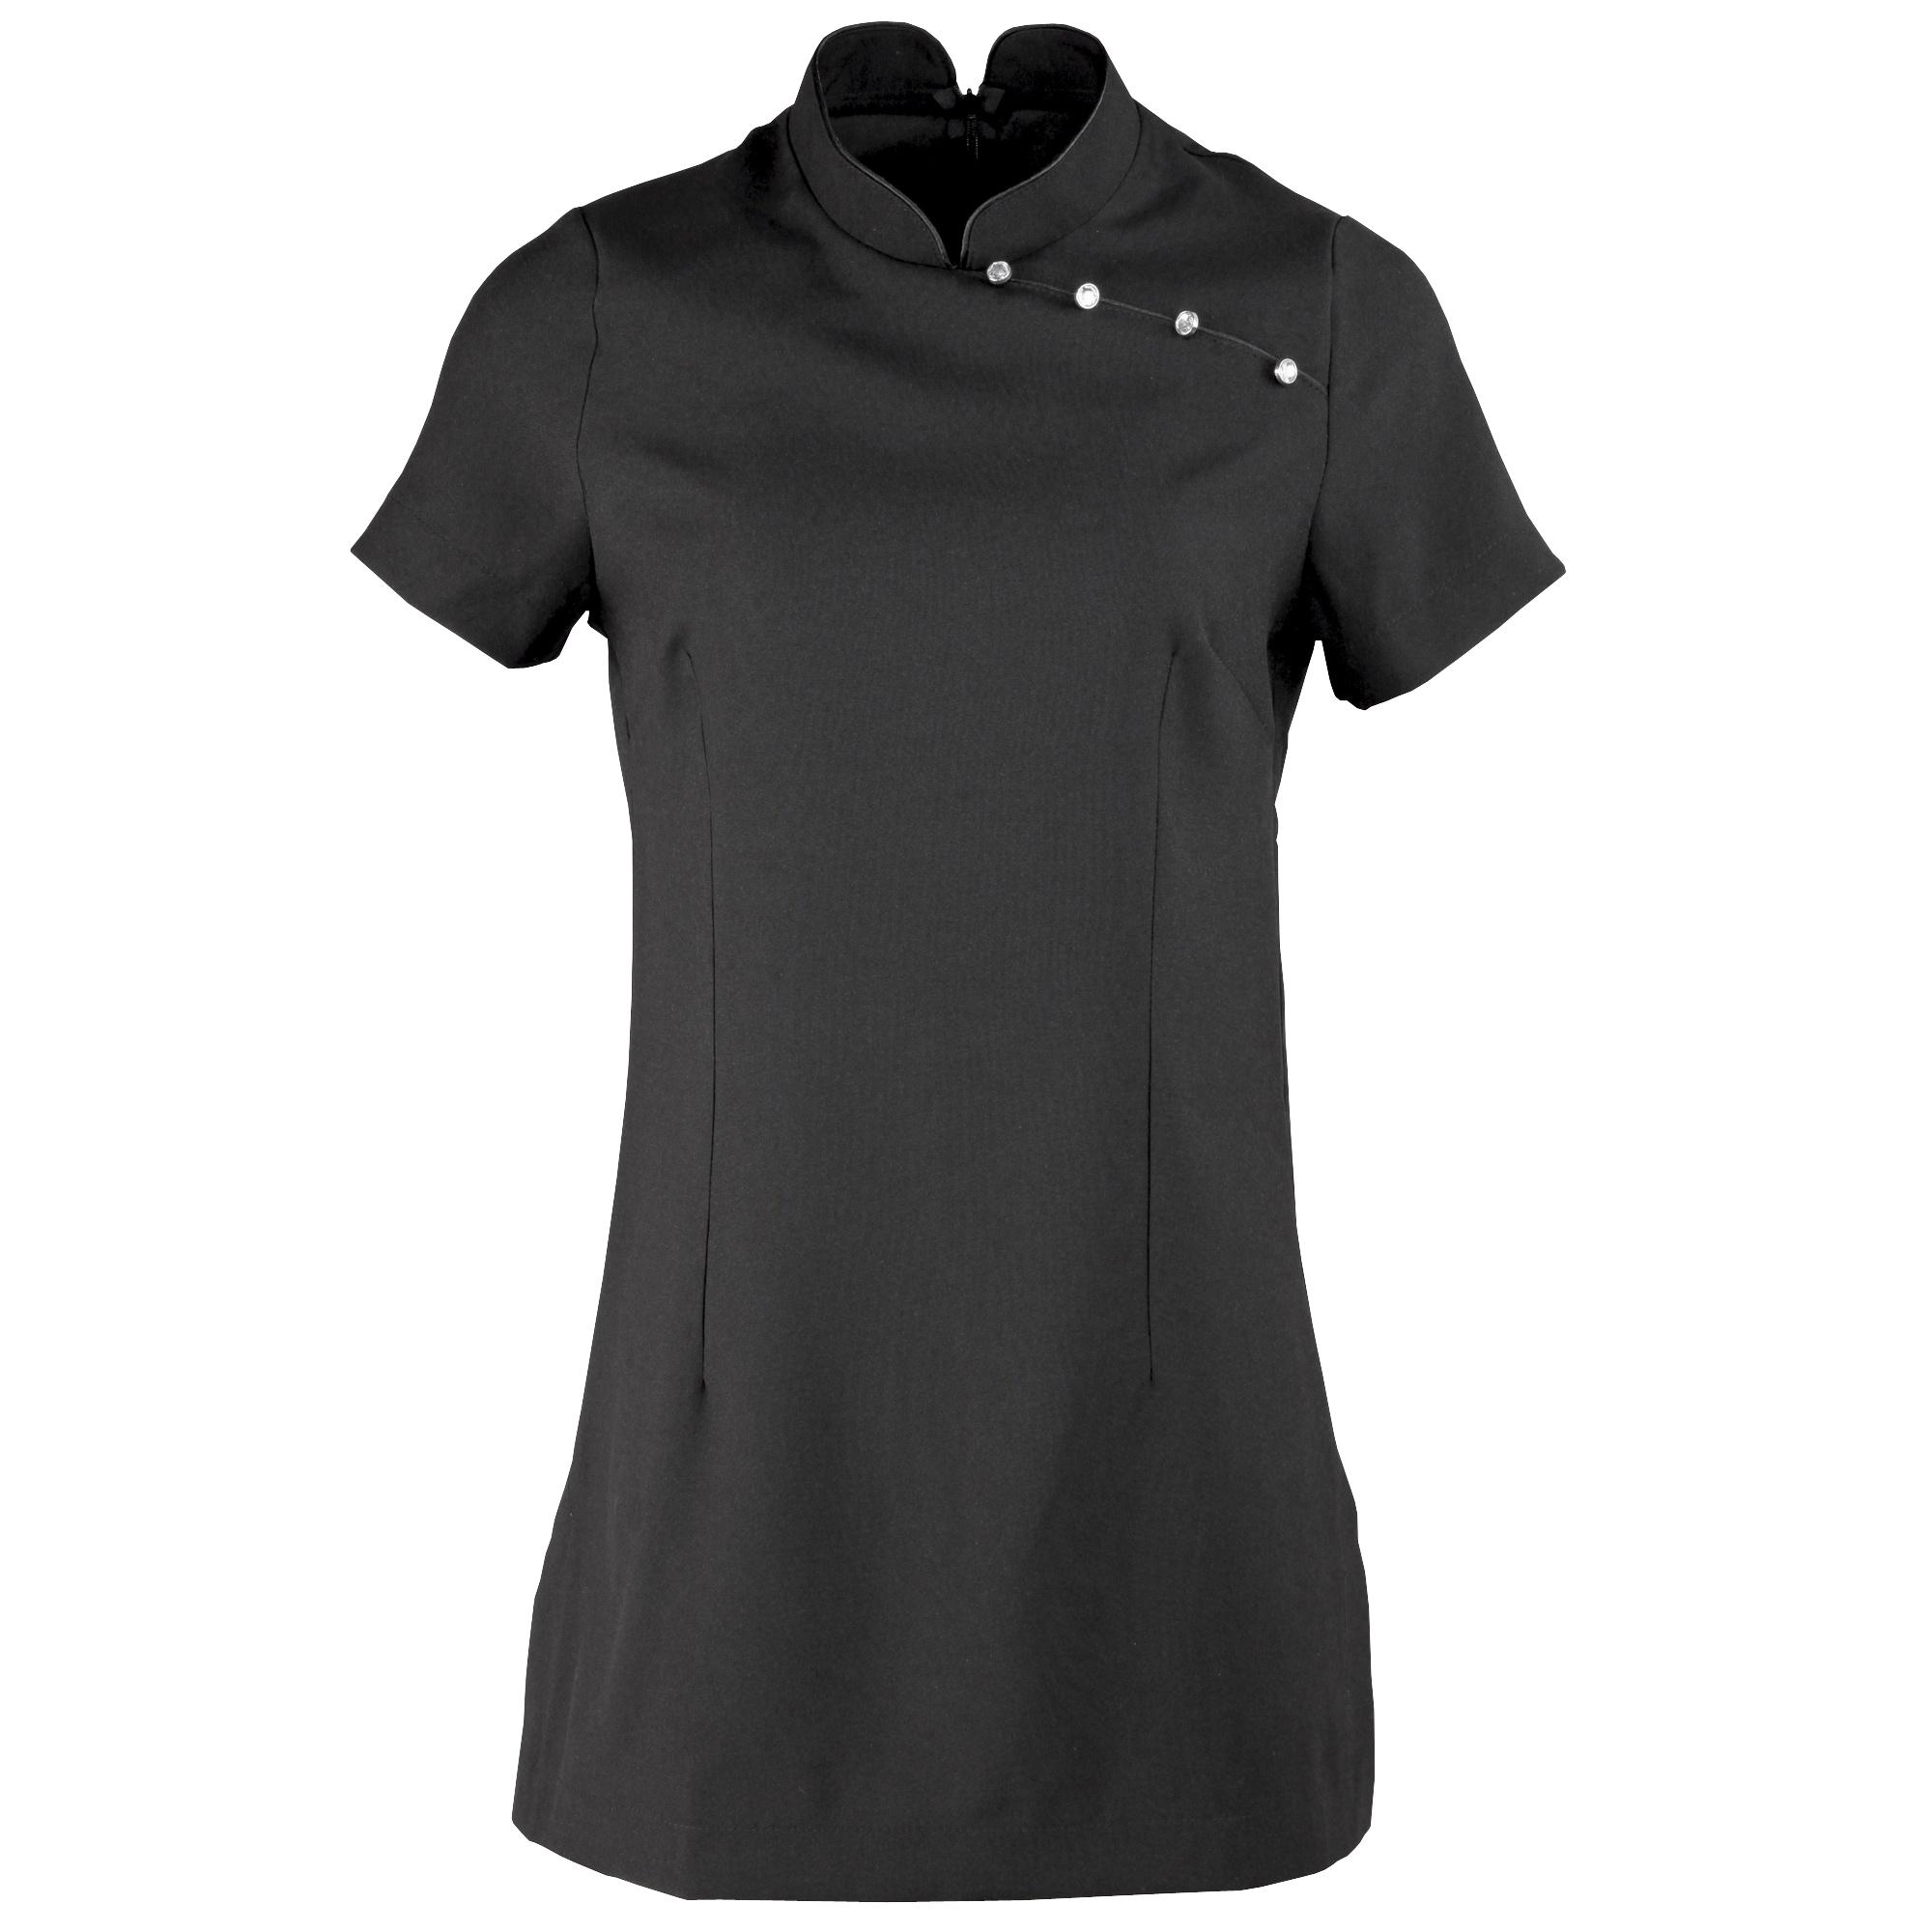 Premier Ladies/Womens *Mika* Tunic / Health Beauty & Spa / Workwear (Pack of 2) (8) (Black)